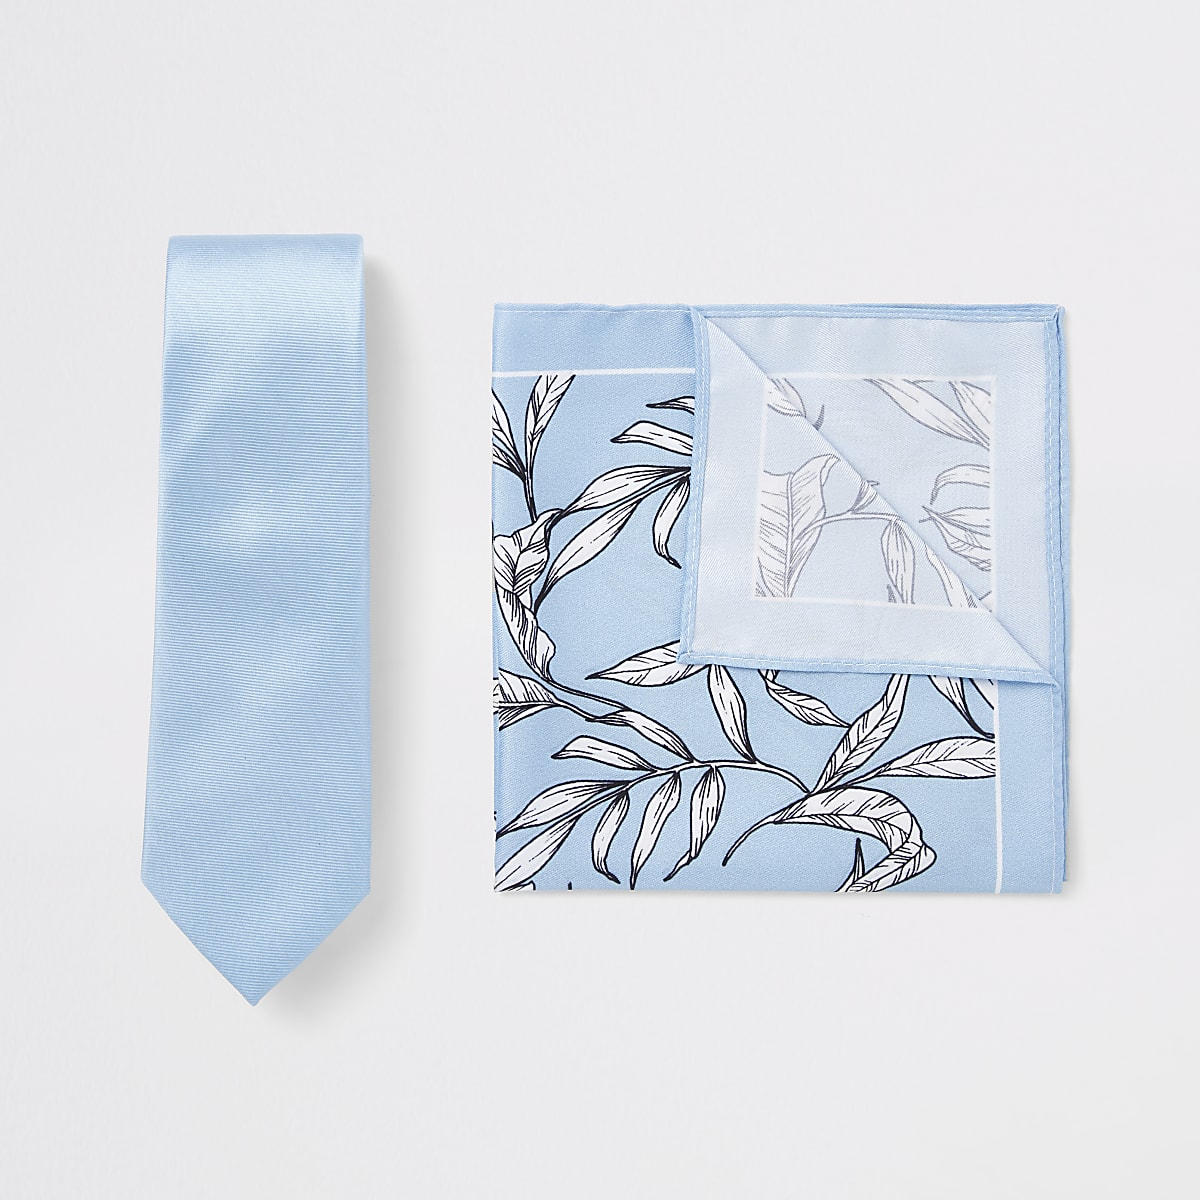 Blue tie and floral handkerchief set